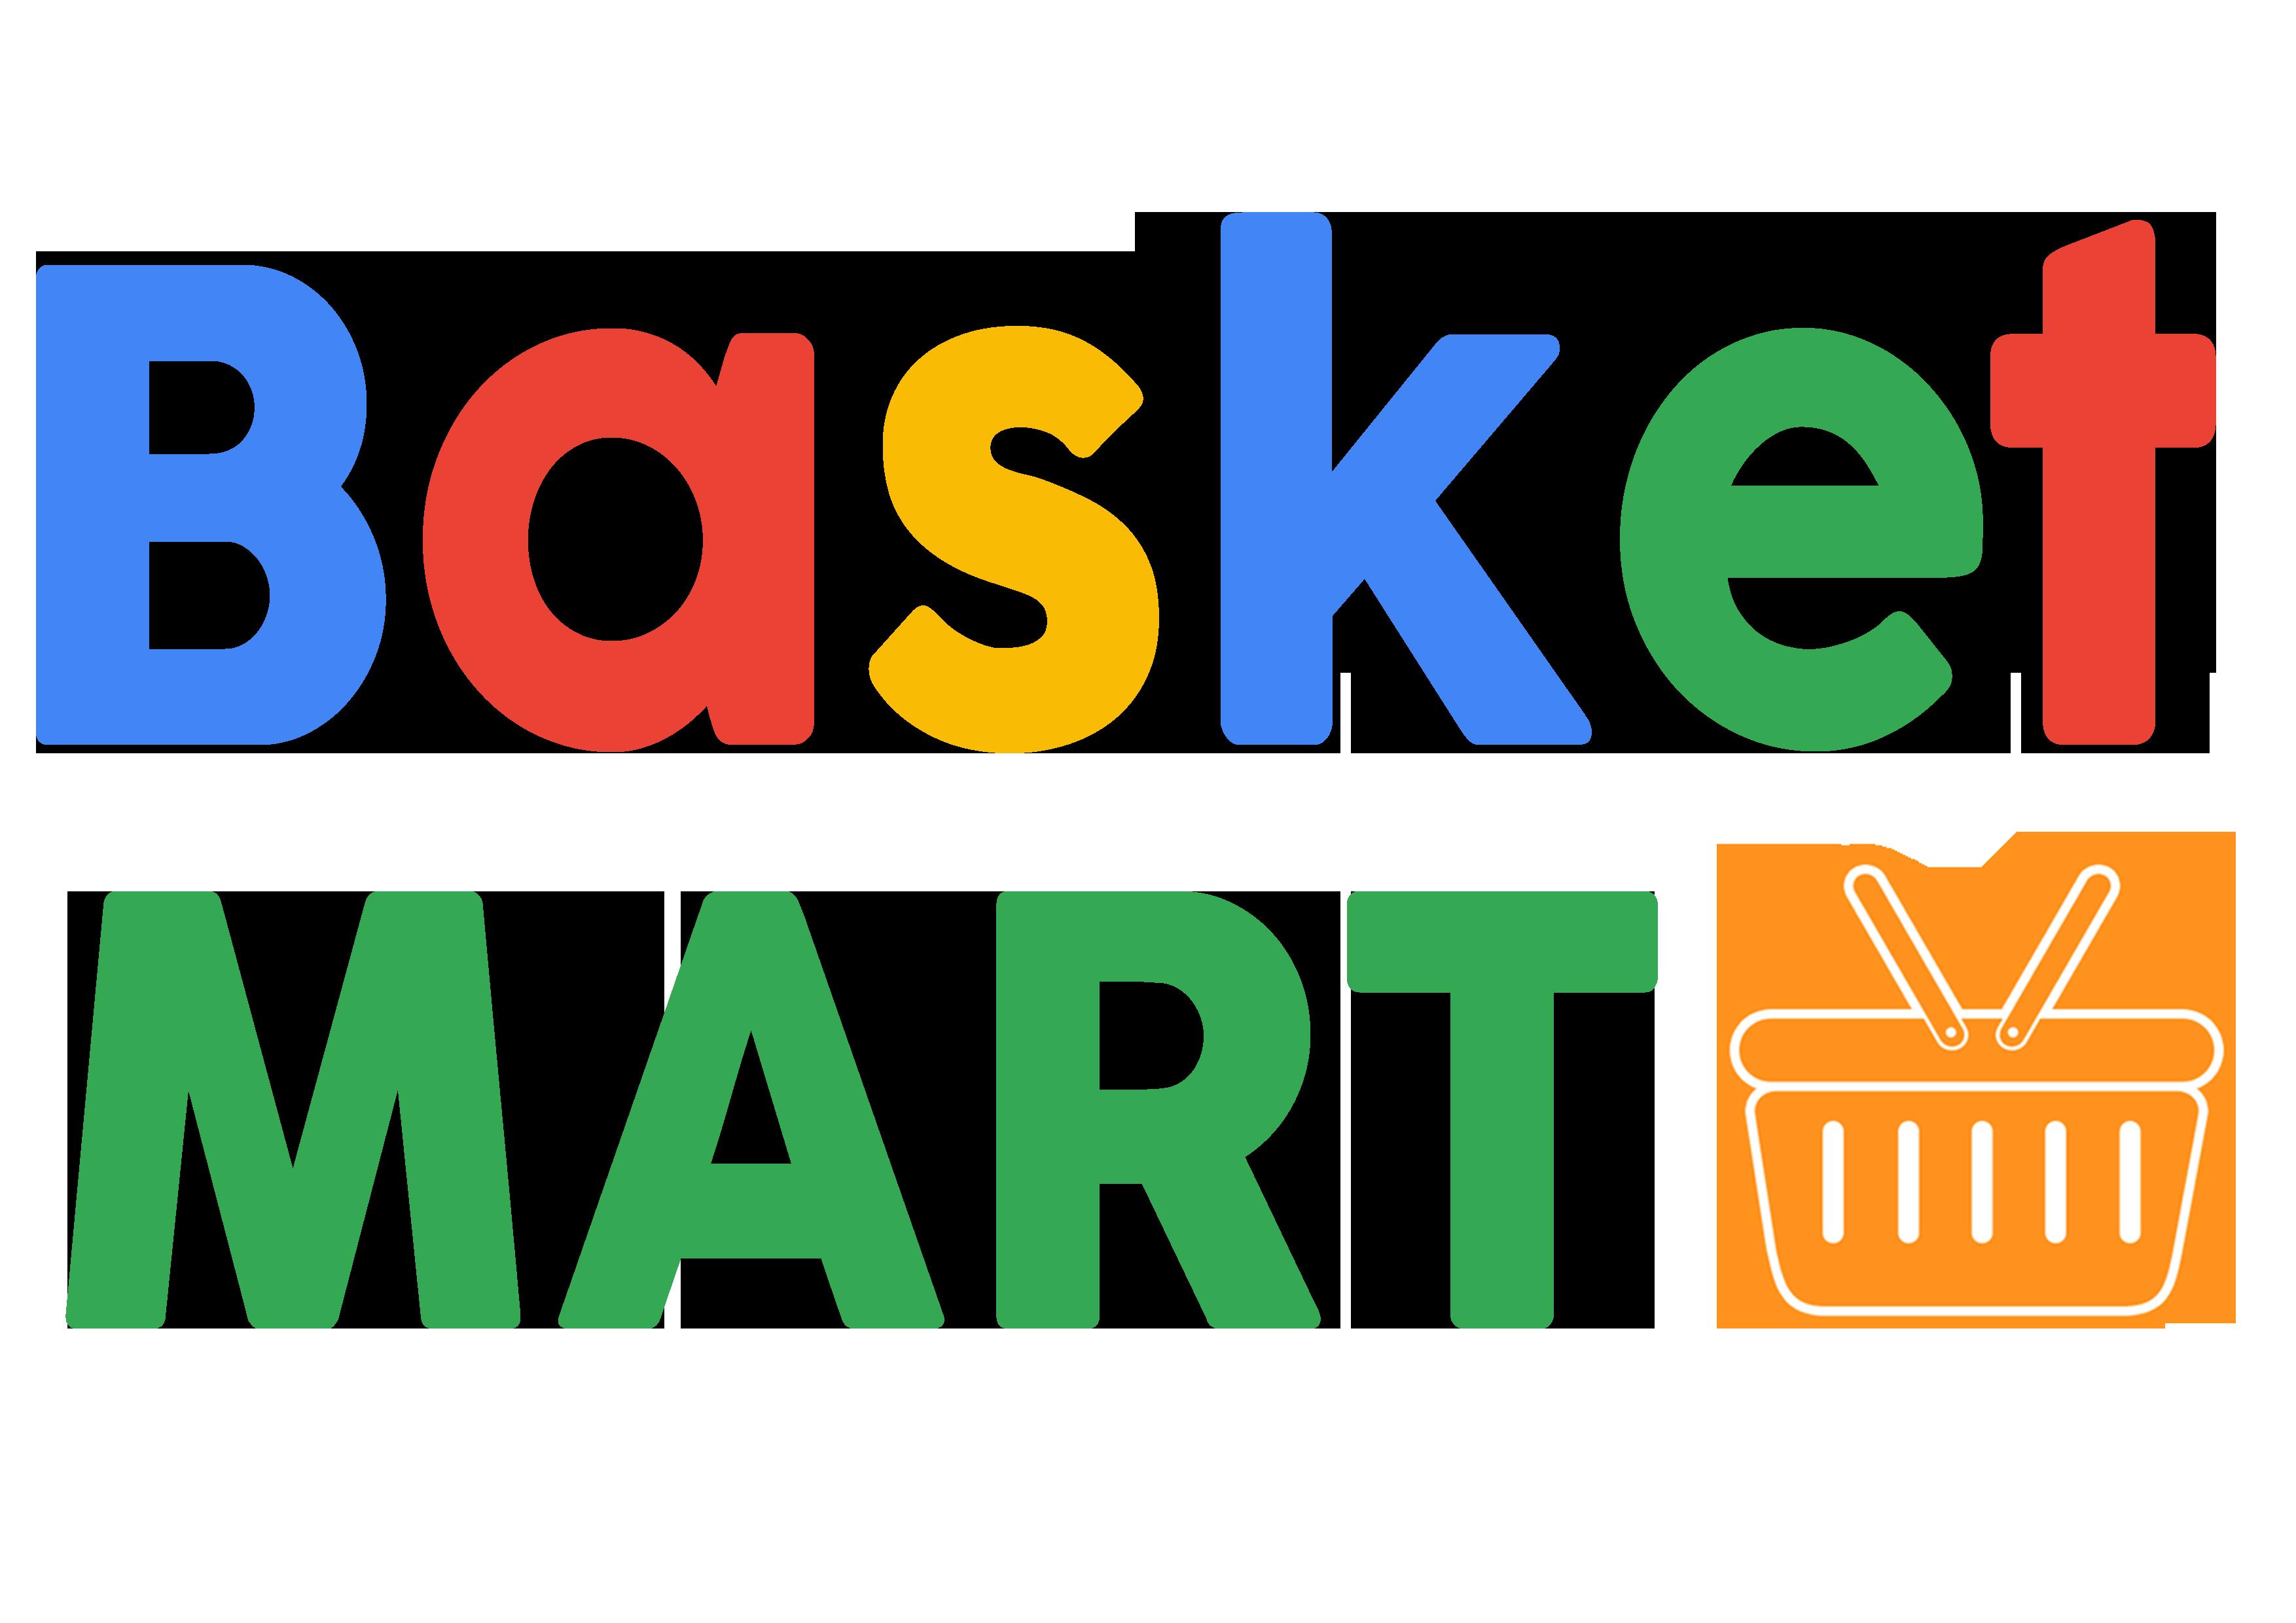 Basket Mart, Daily Rocket Delivery Clark.Angeles, 바스켓마트, 매일로켓배송, 클락앙헬레스마트,  篮市